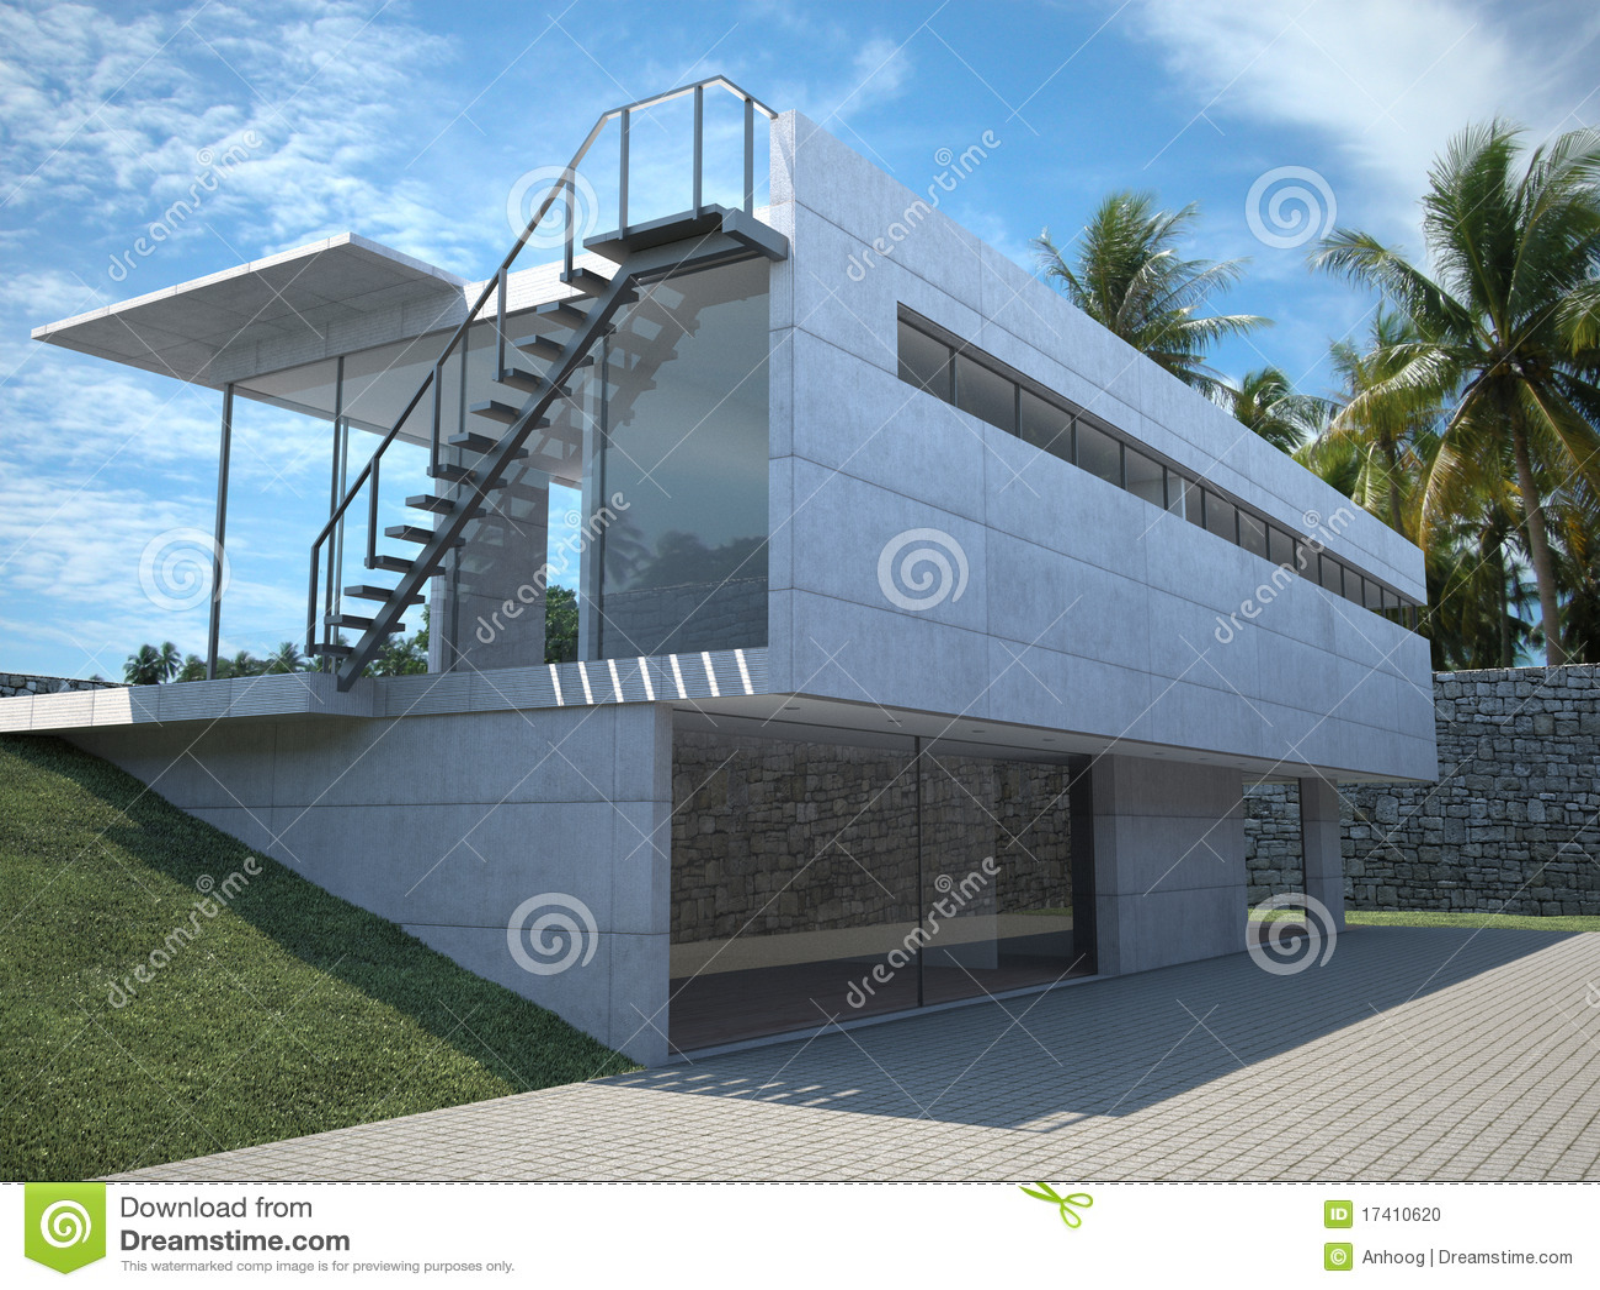 dipingere esterno casa: tinteggiature interni esterni mordano ... - Dipingere Esterno Casa